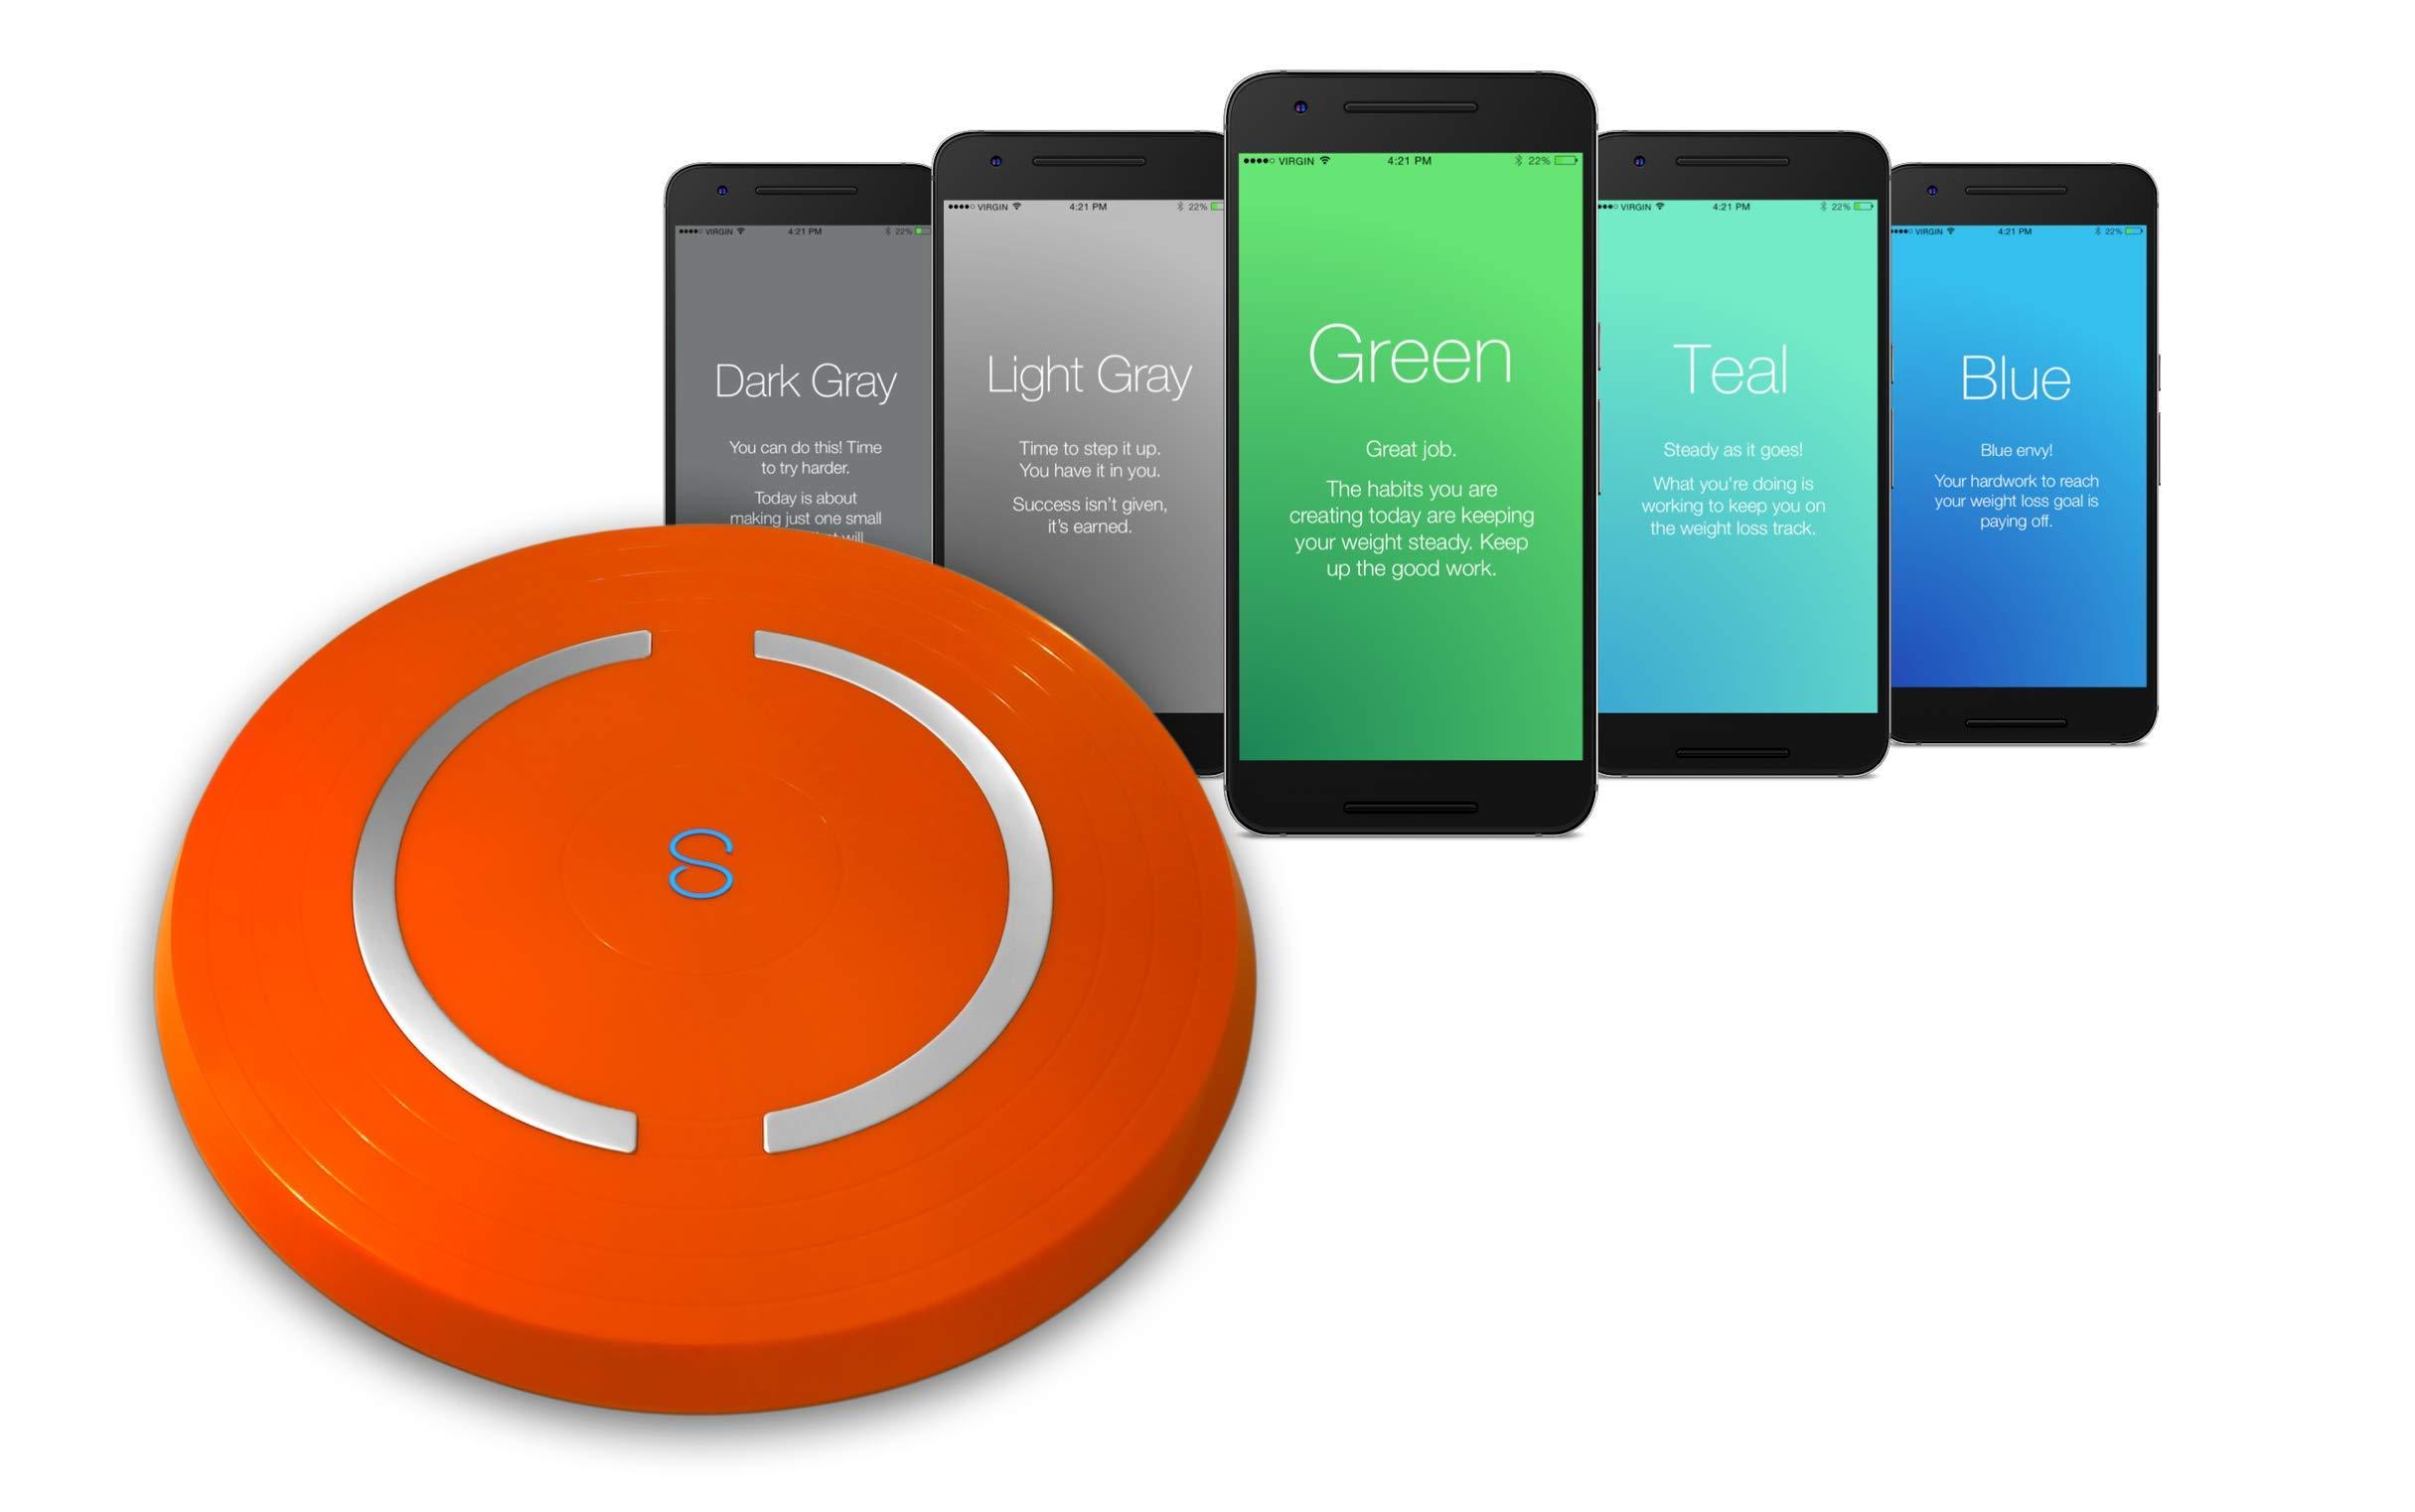 Shapa Smart Scale and Virtual Program for 12 Weeks (Orange) by Shapa